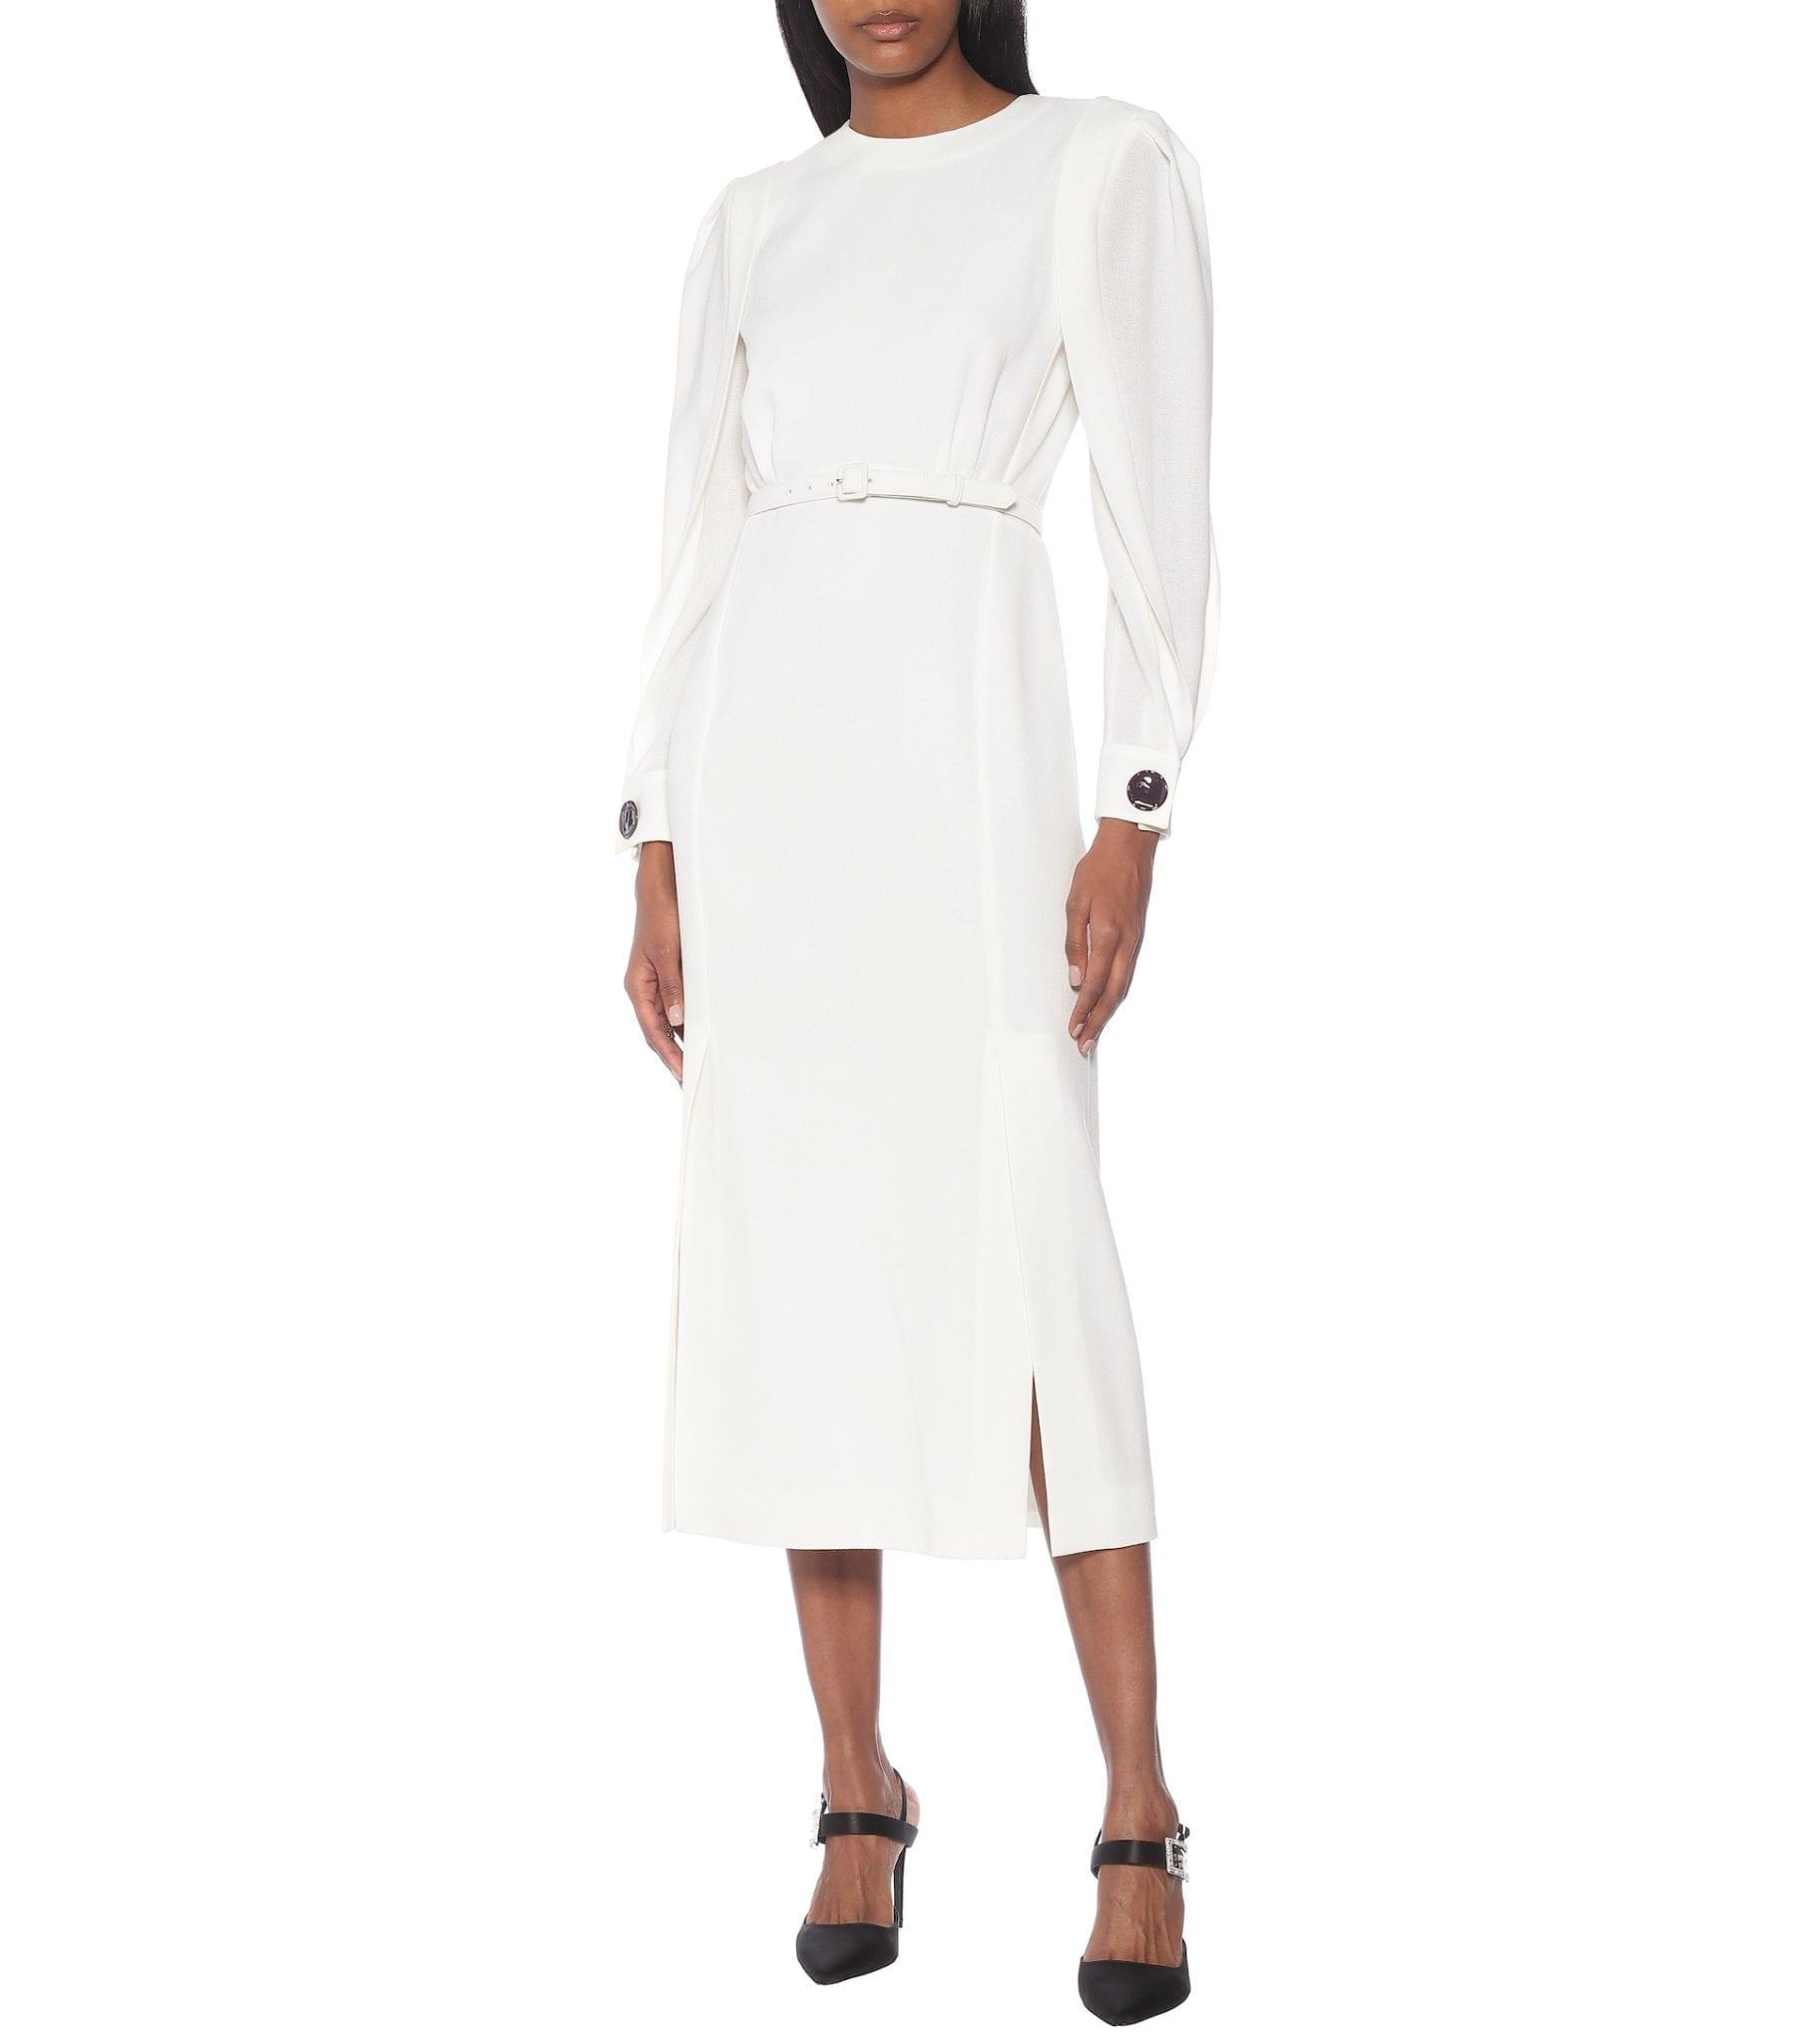 GIVENCHY Wool Crêpe Midi Dress